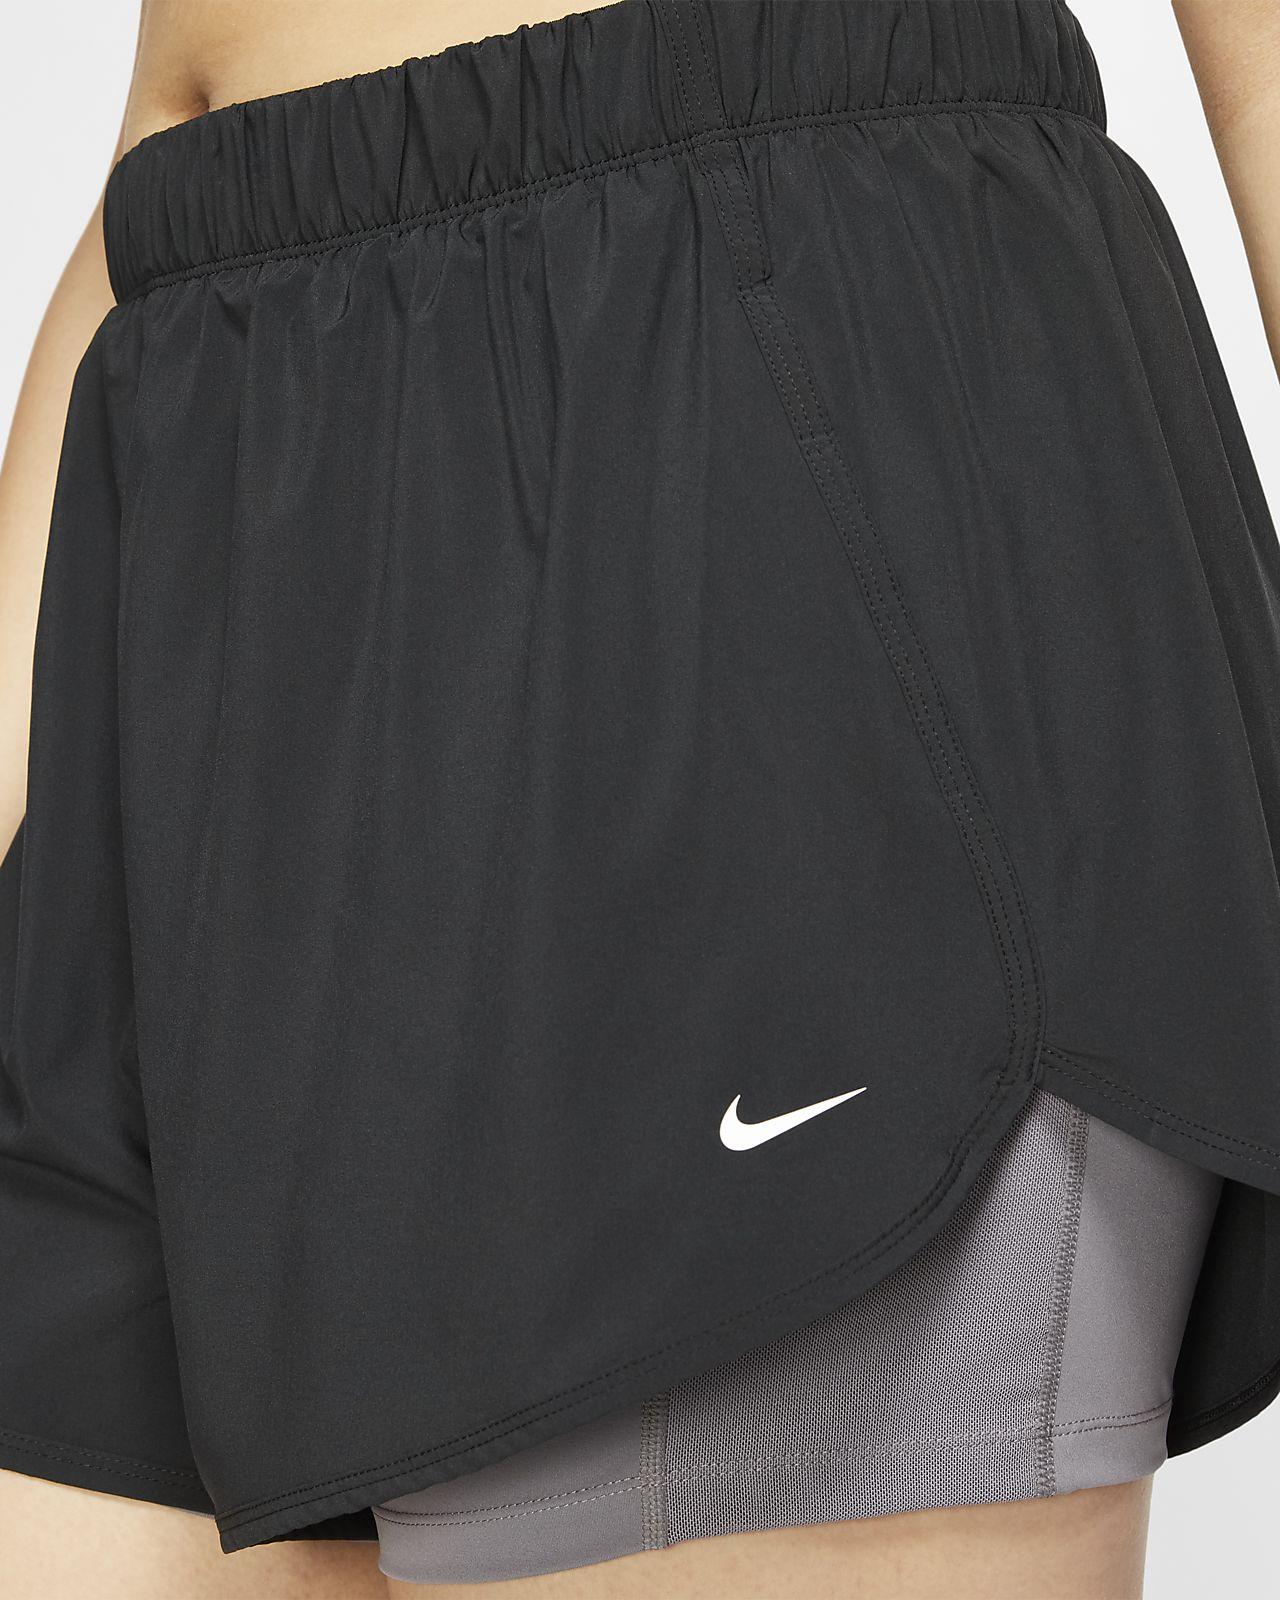 cca33984972 Nike Flex Women s 2-in-1 Training Shorts (Plus Size). Nike.com